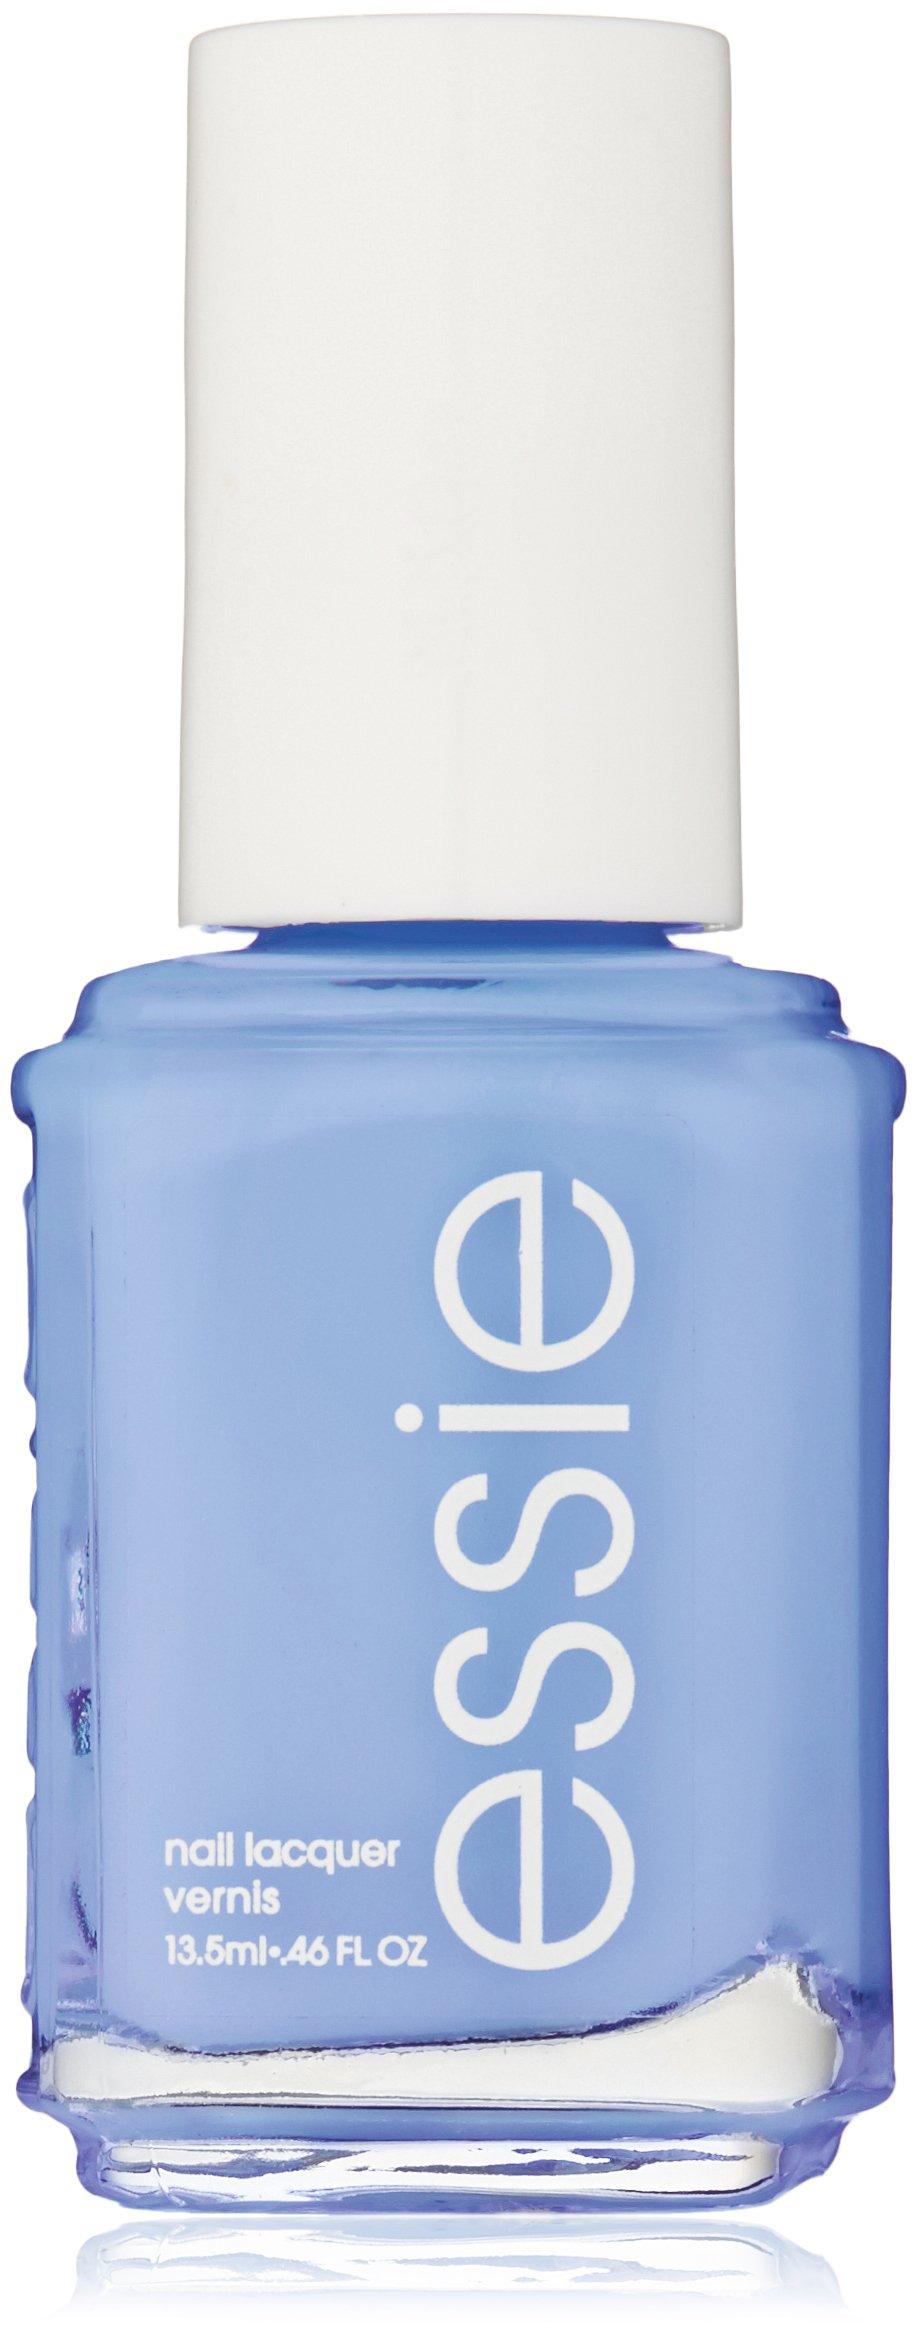 Amazon.com : essie nail polish, butler please, bright blue nail ...